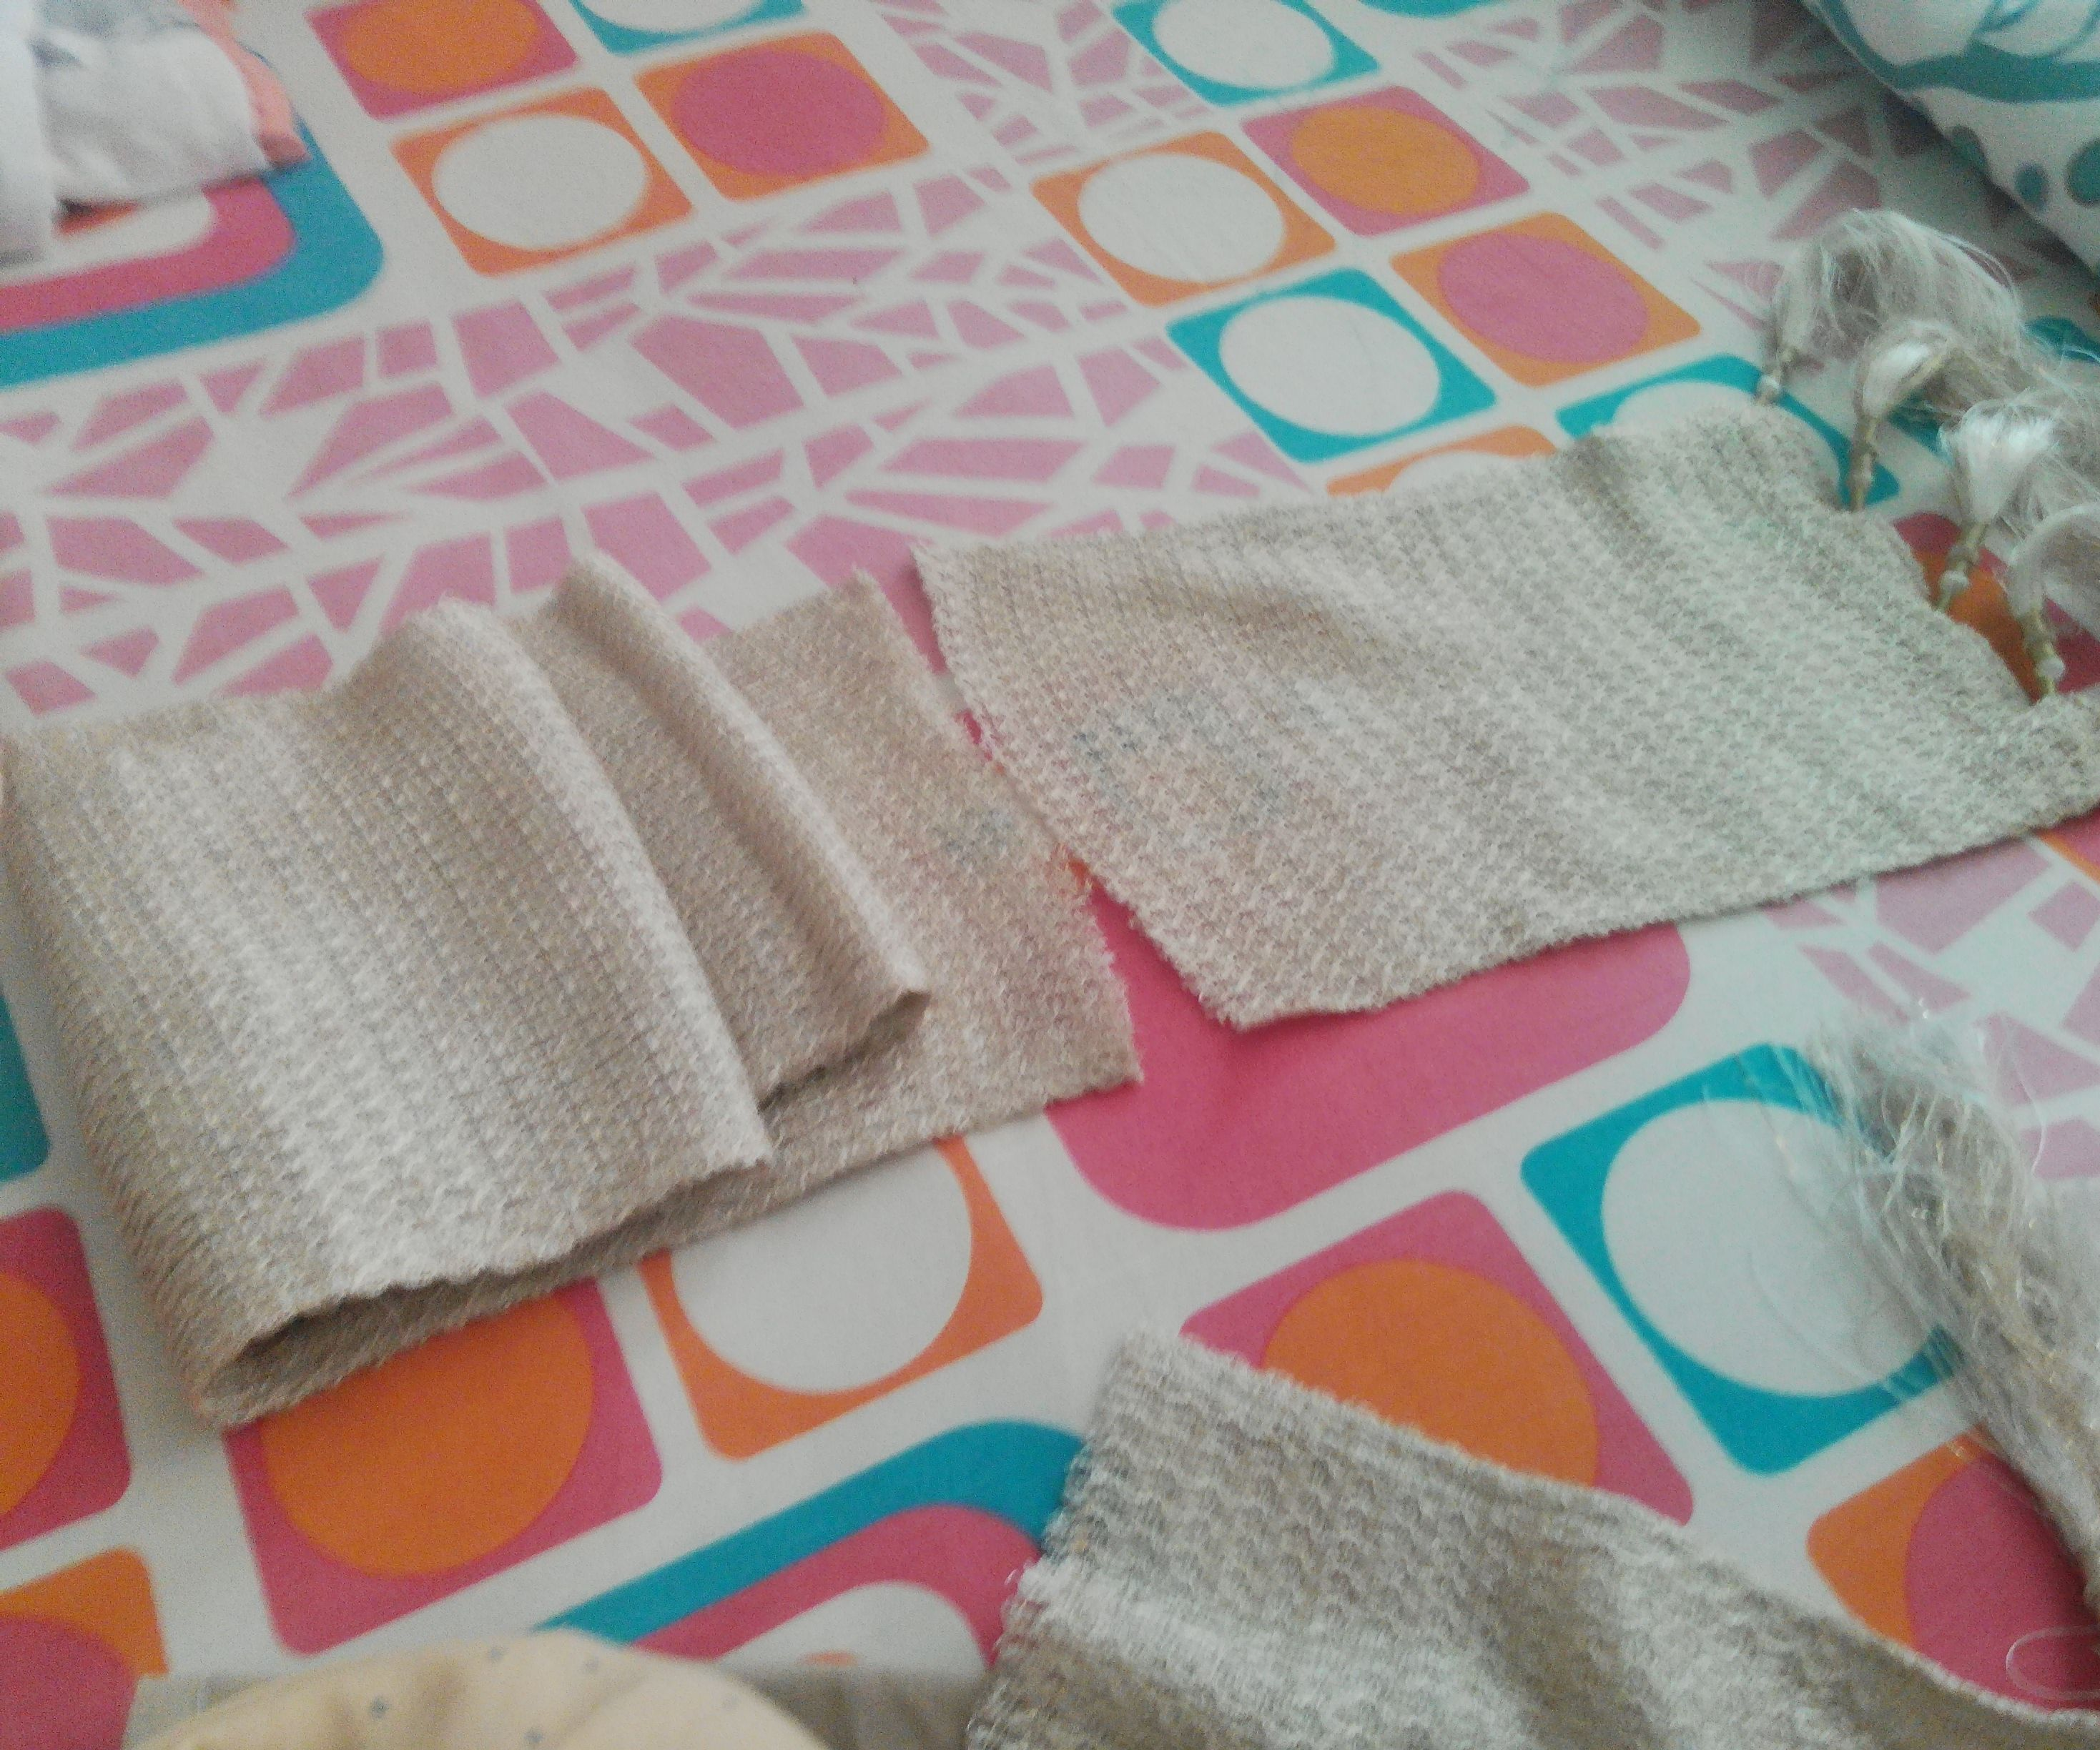 Shoulder bag using a scarf fabric